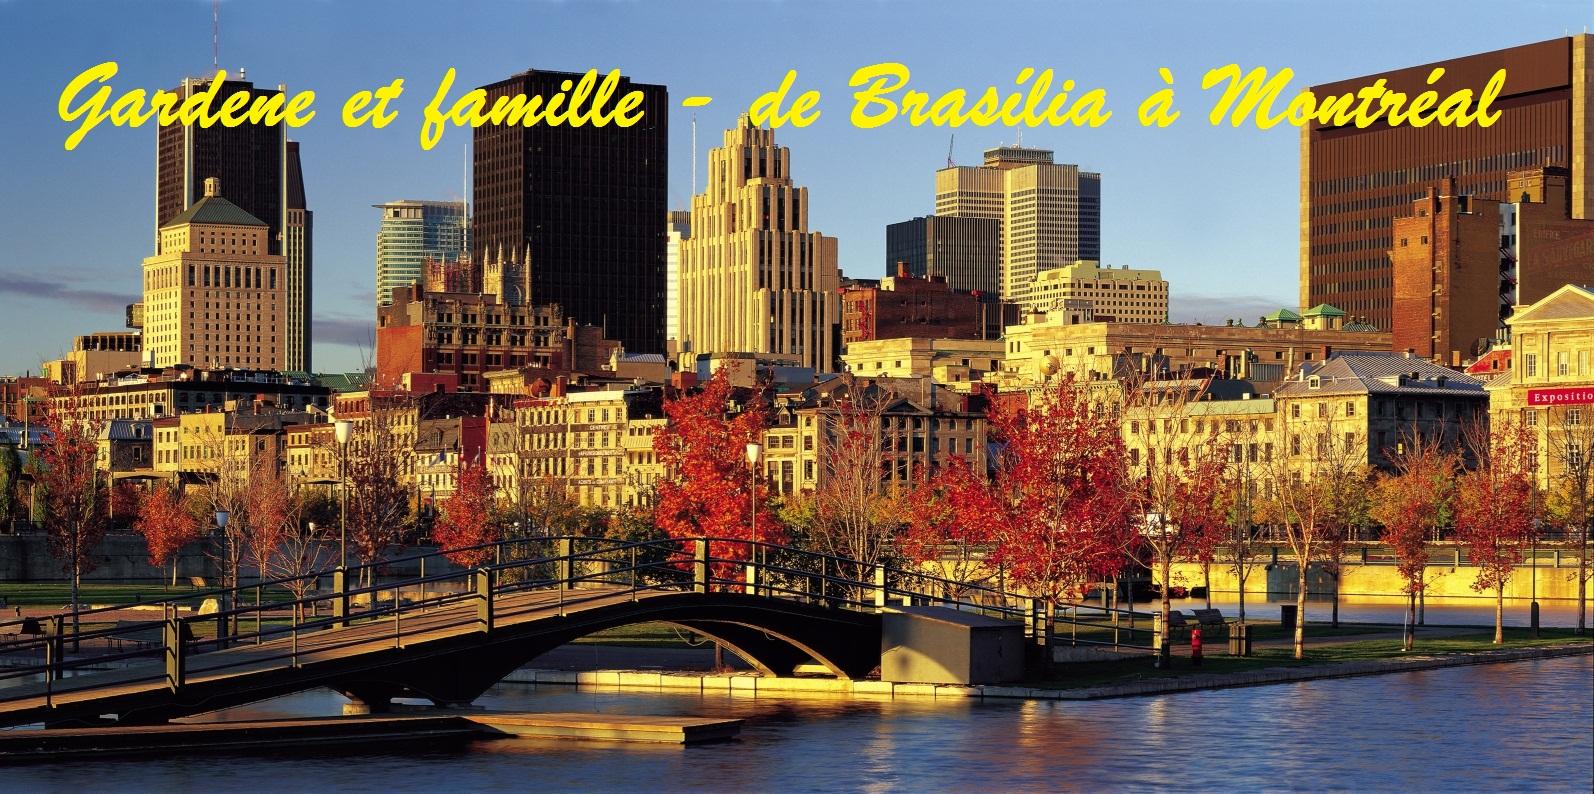 Gardene et famille - de Brasília à Montréal